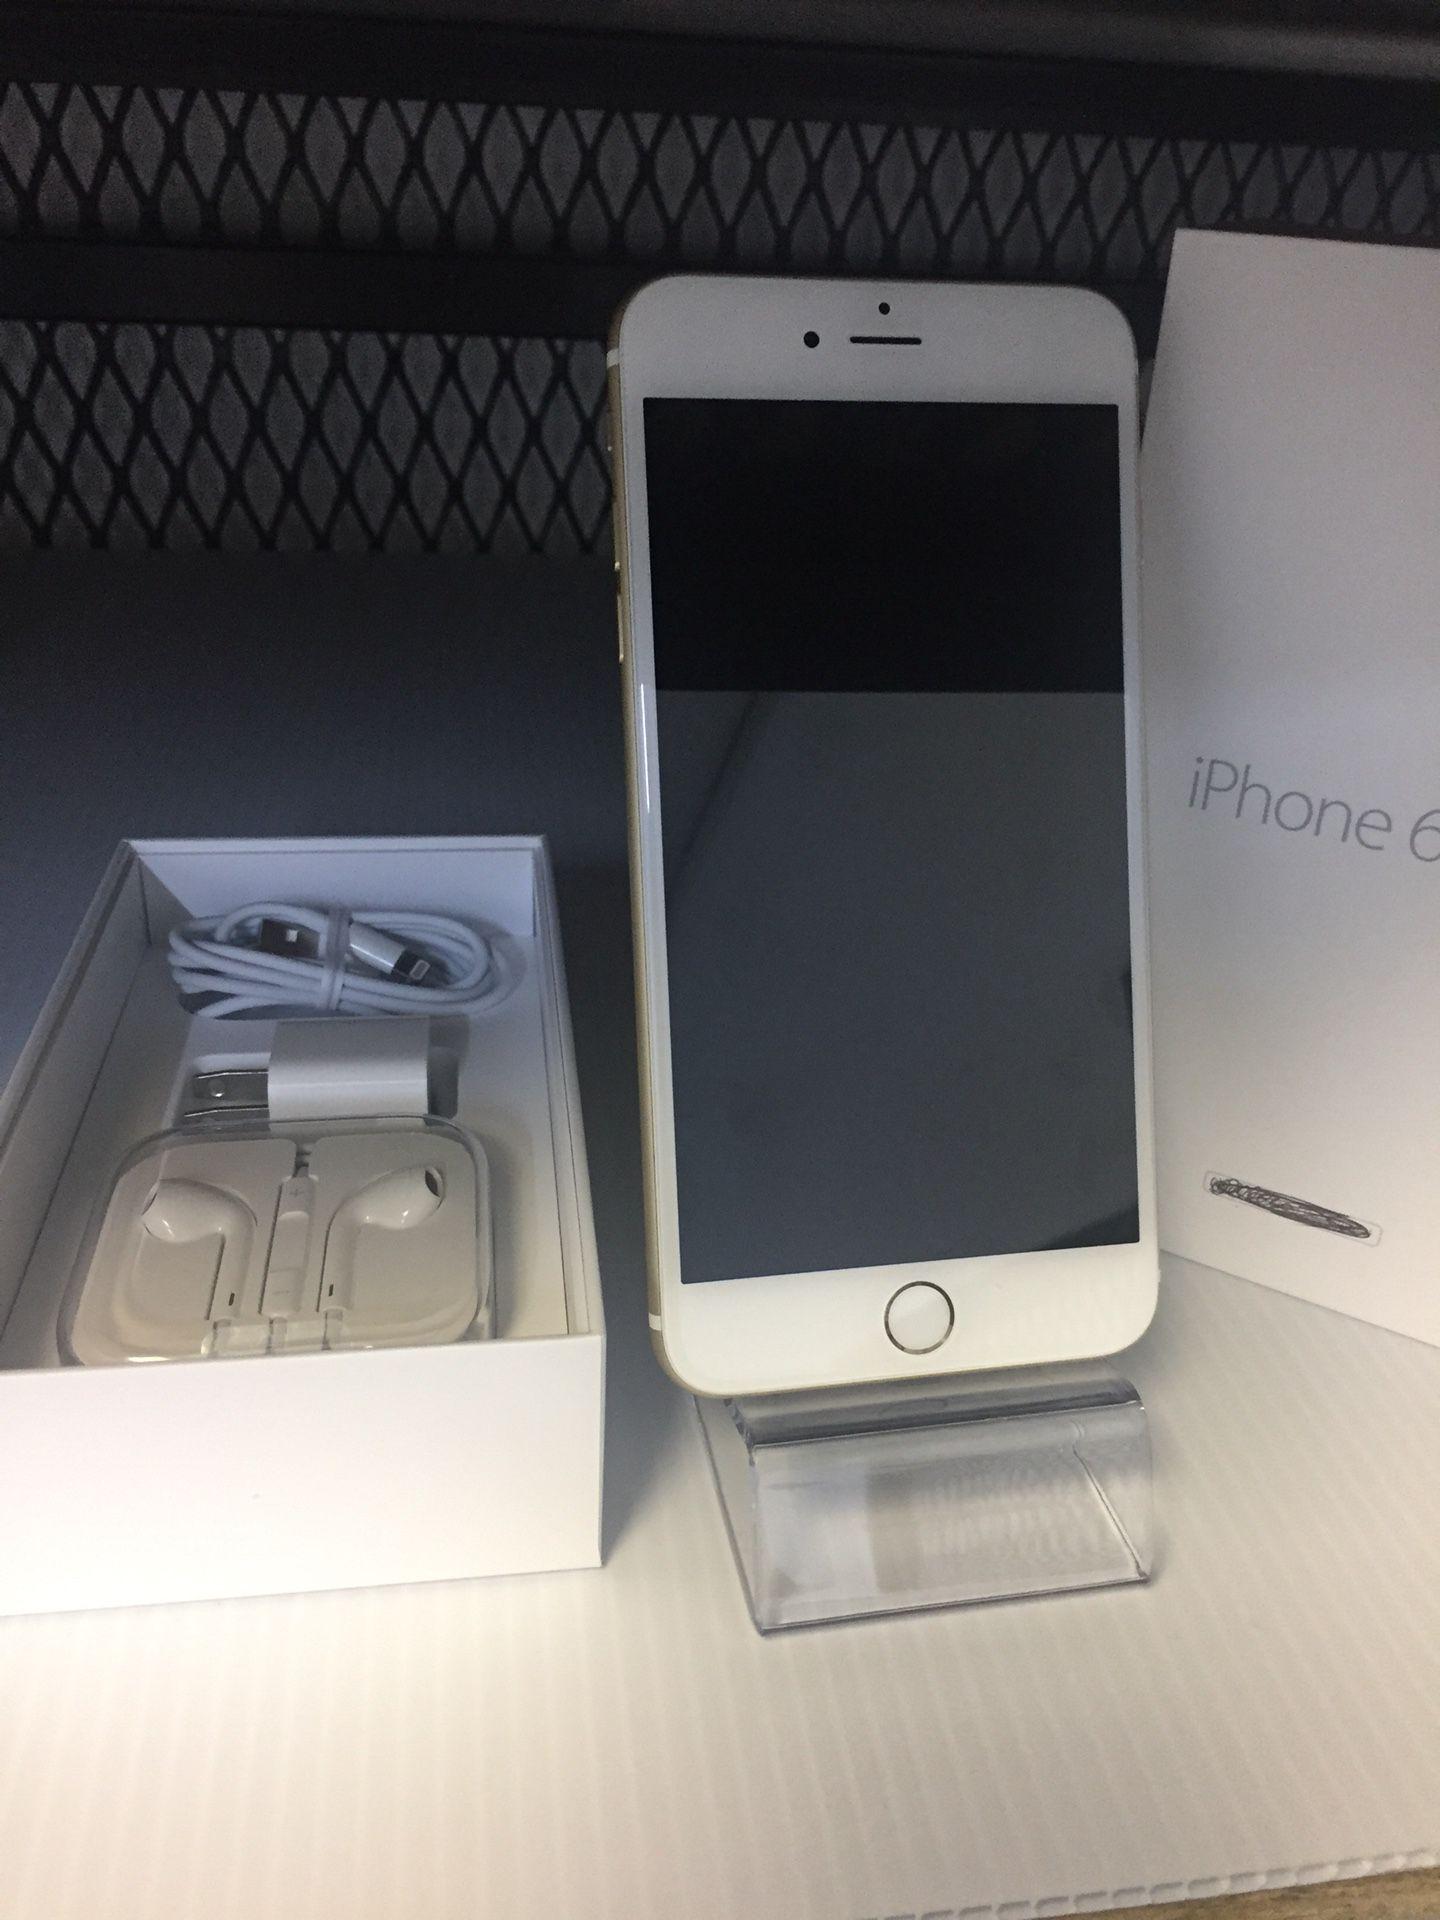 iPhone 6 Plus unlocked 16 GB new